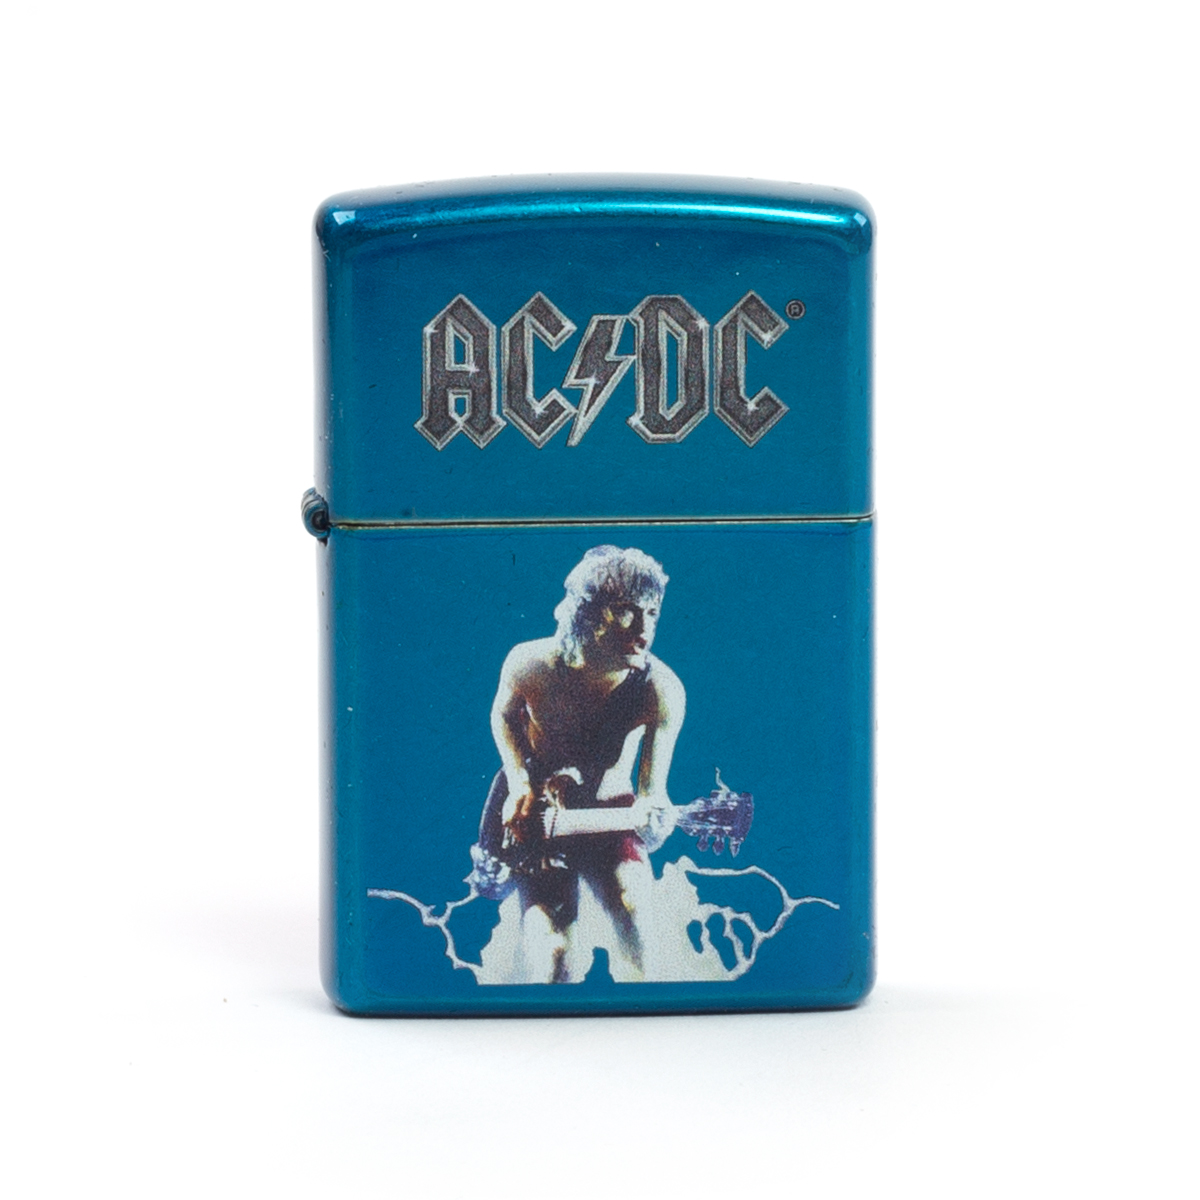 AC/DC Angus Photo Blue Zippo Lighter